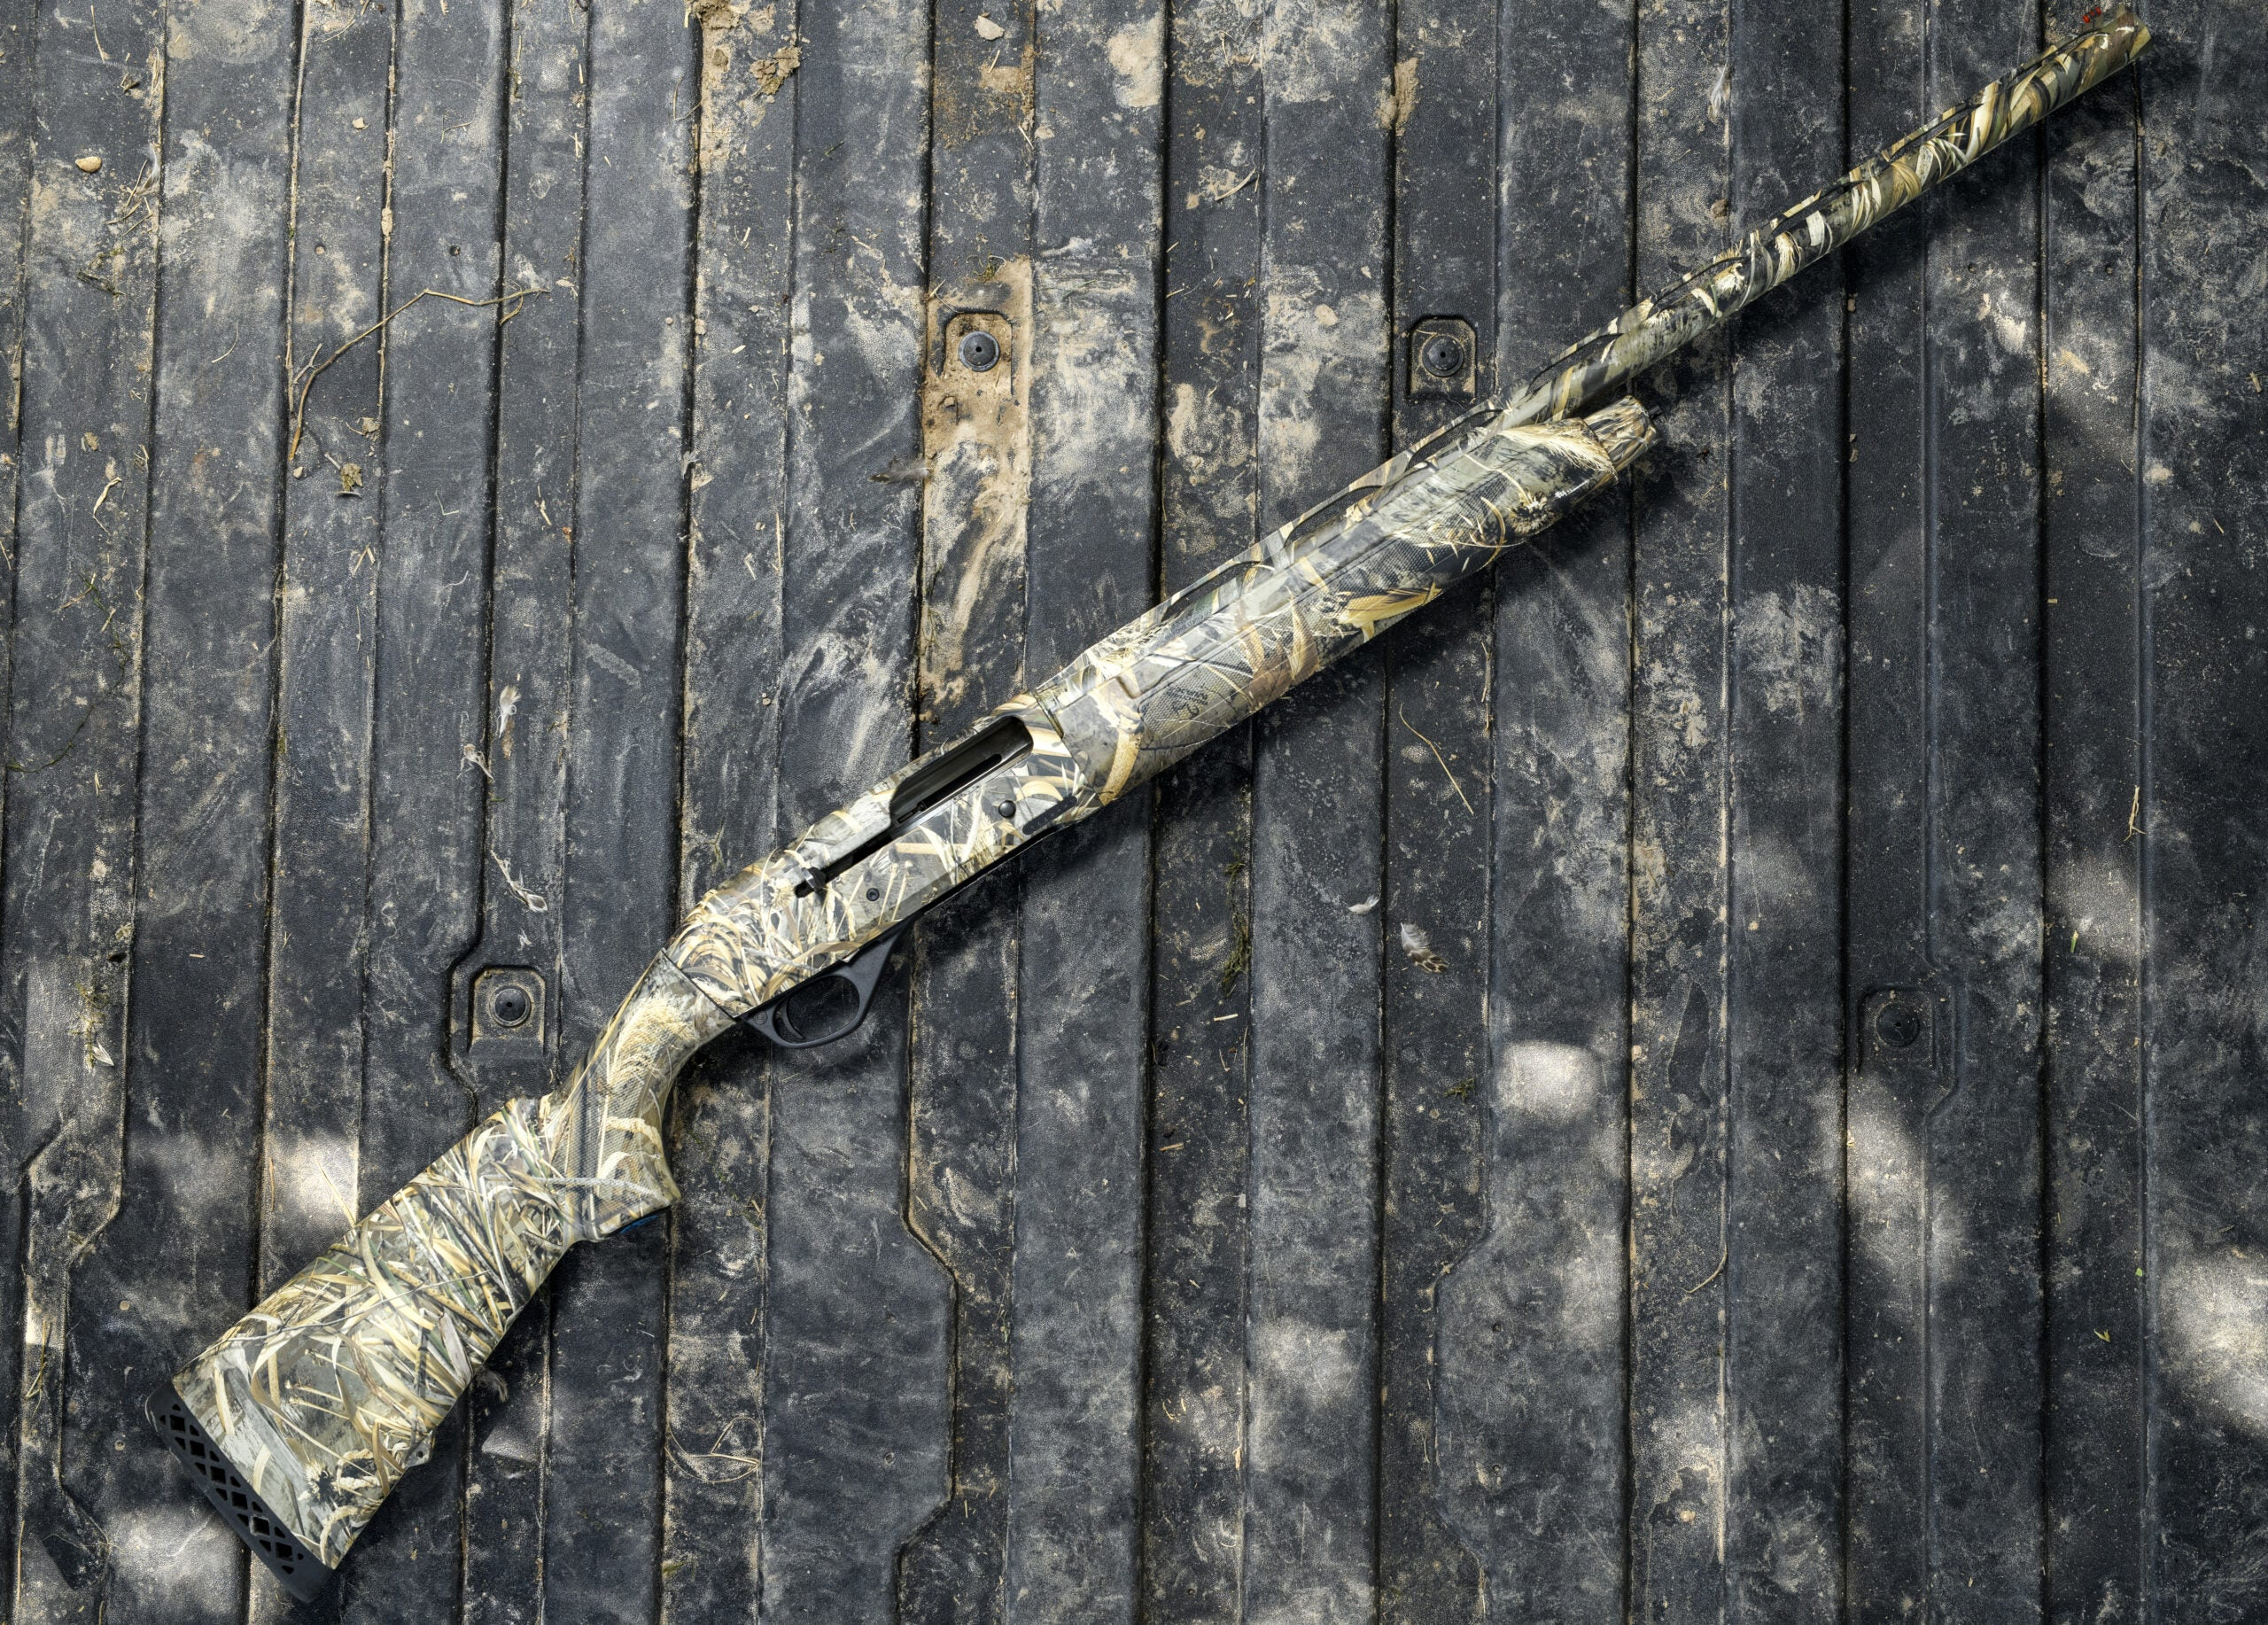 Stoeger M3000 is the best duck hunting shotgun